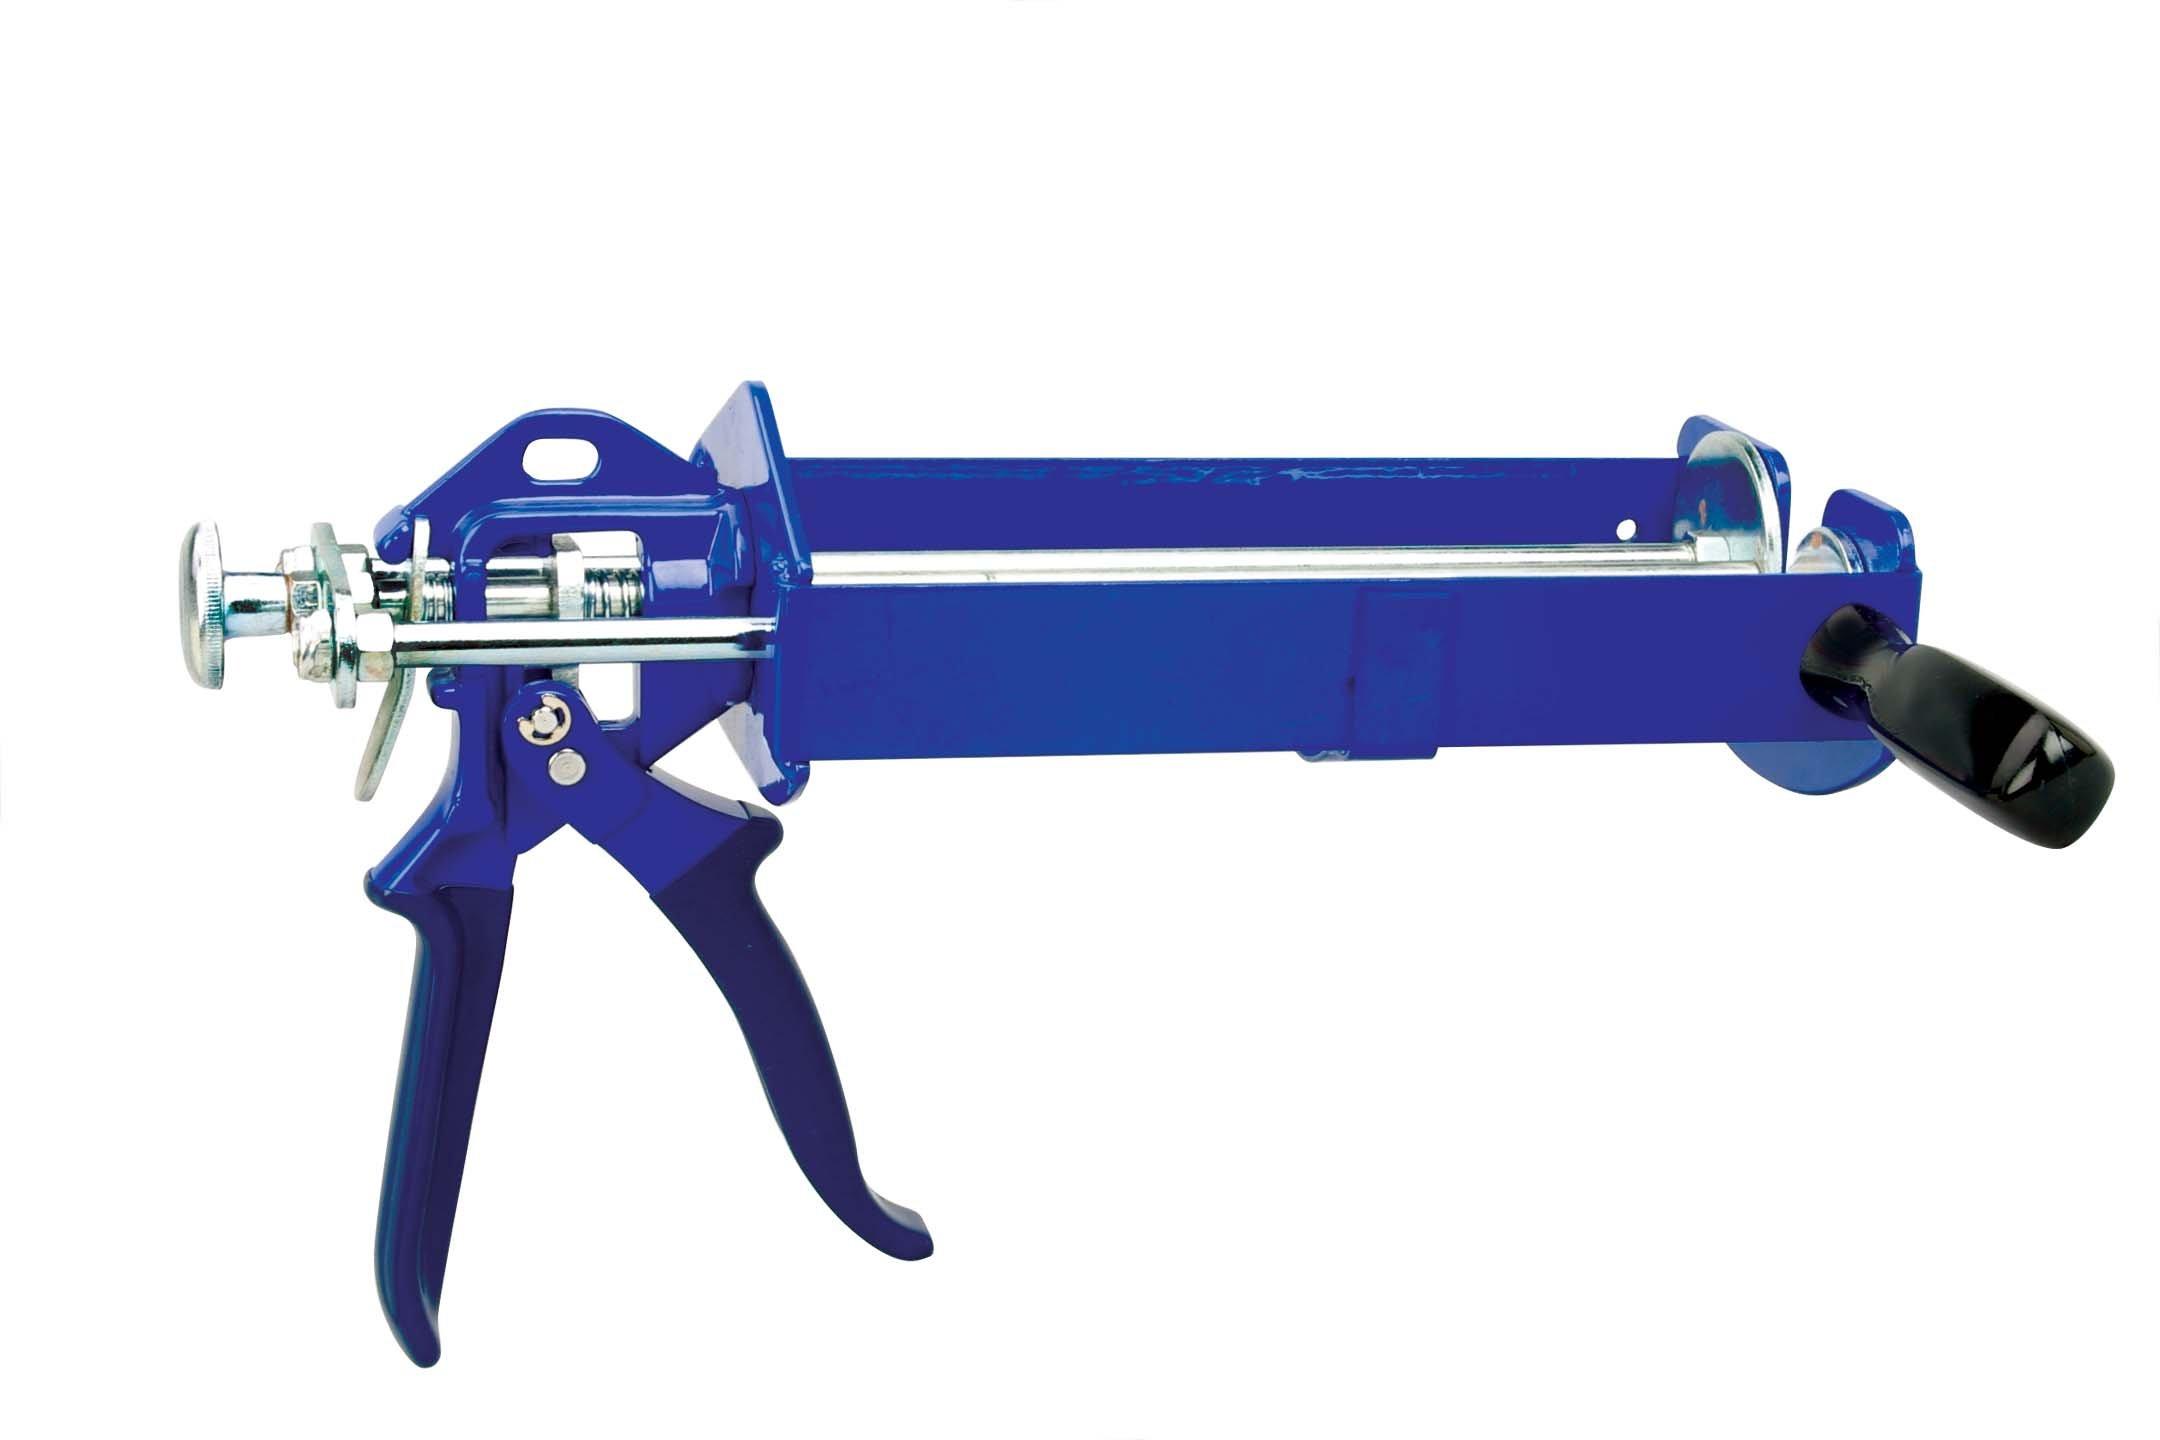 Wellmade Tools 3360 Dual Cartridge Manual Epoxy Applicator, 600ml  x 300ml by Wellmade Tools